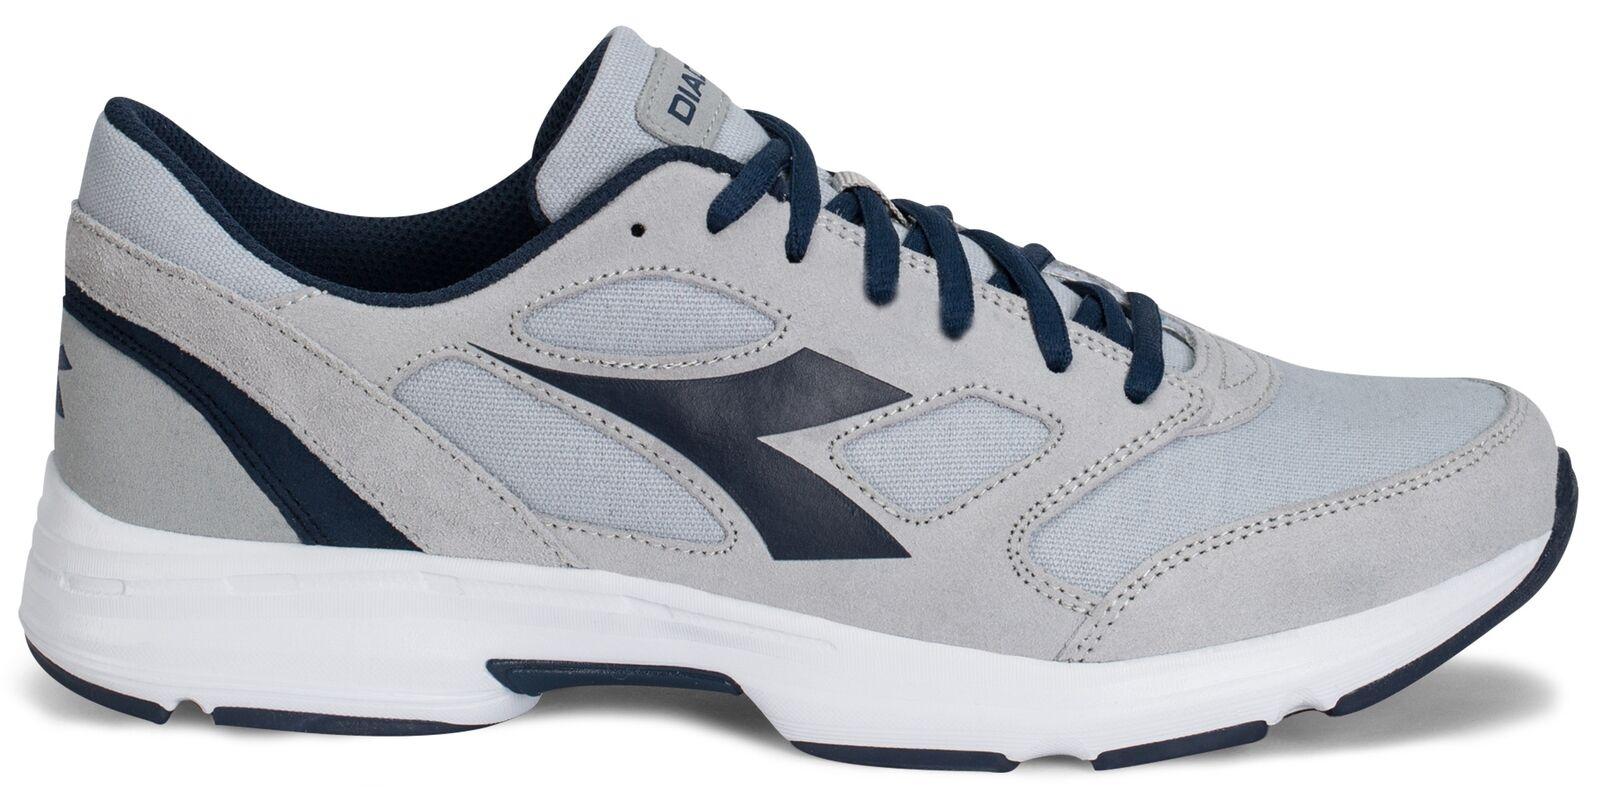 Diadora Scarpa Running Sneaker Jogging men  Shape 7 s Alluminium navy tuareg  buy discounts